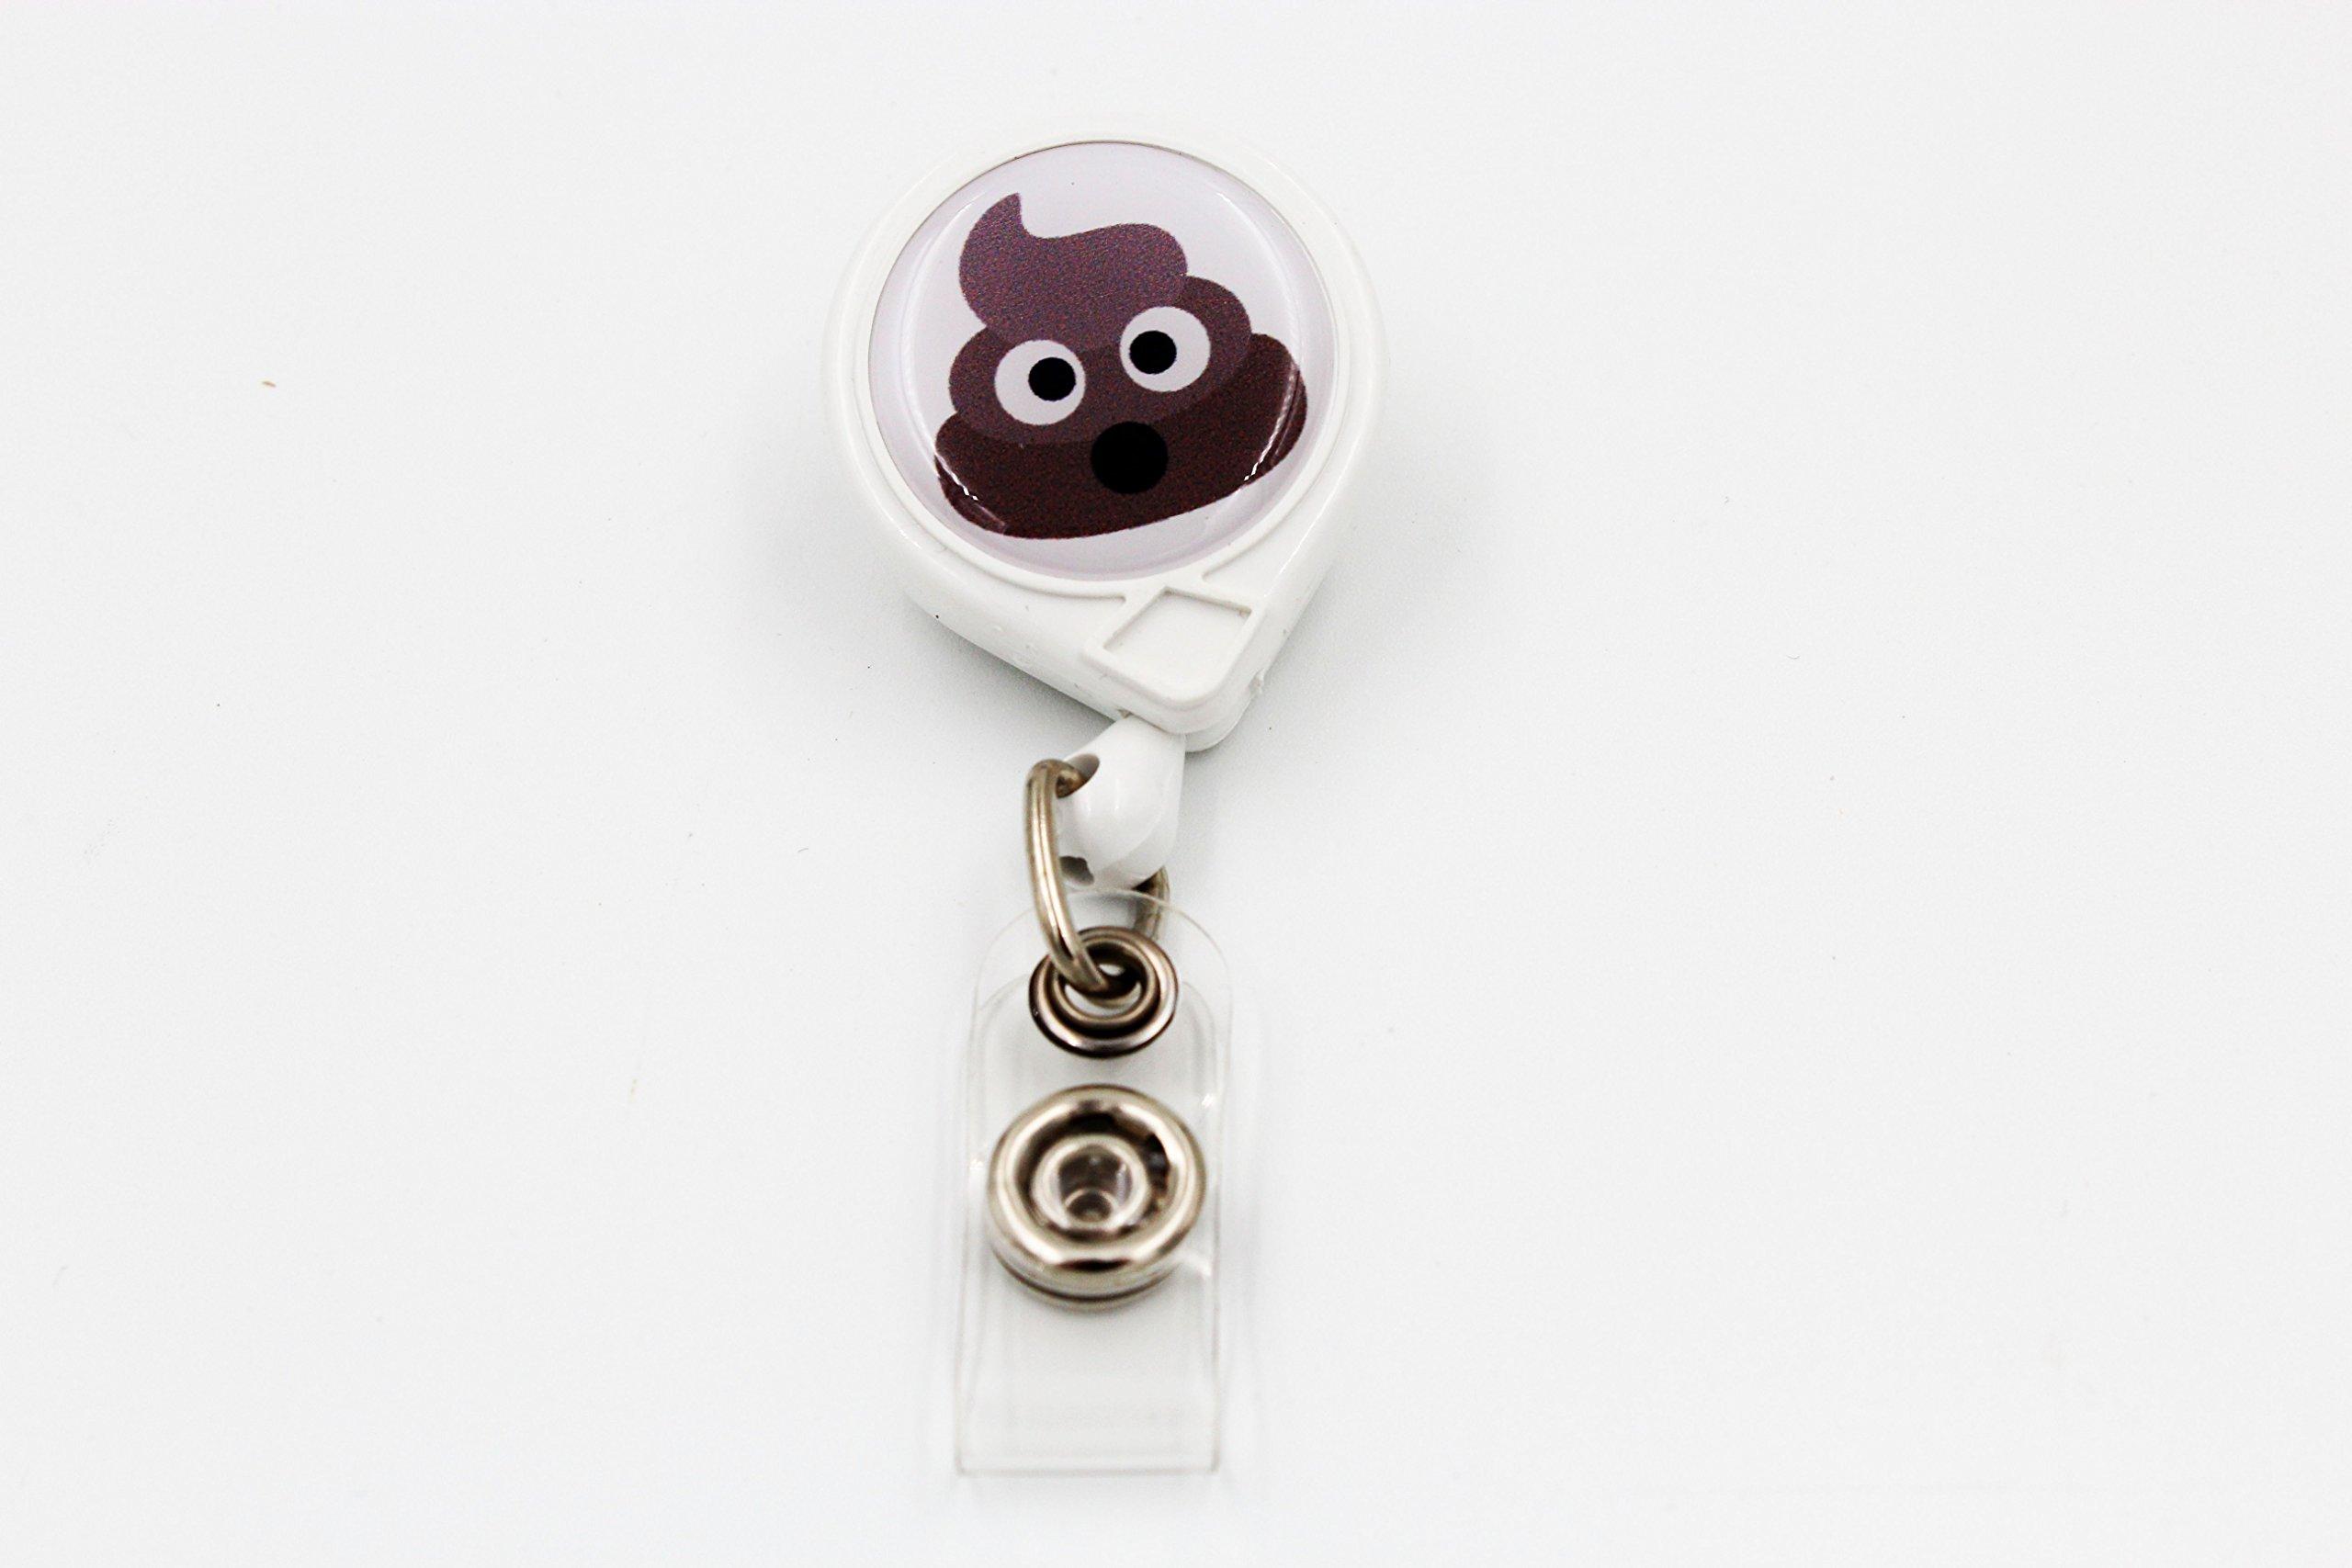 Key-Bak Mini-Bak Emoji Retractable Reel with 36-Inch Nylon Cord, Steel Belt Clip and Vinyl ID Strap (Emoji - Pile of Poo, White)